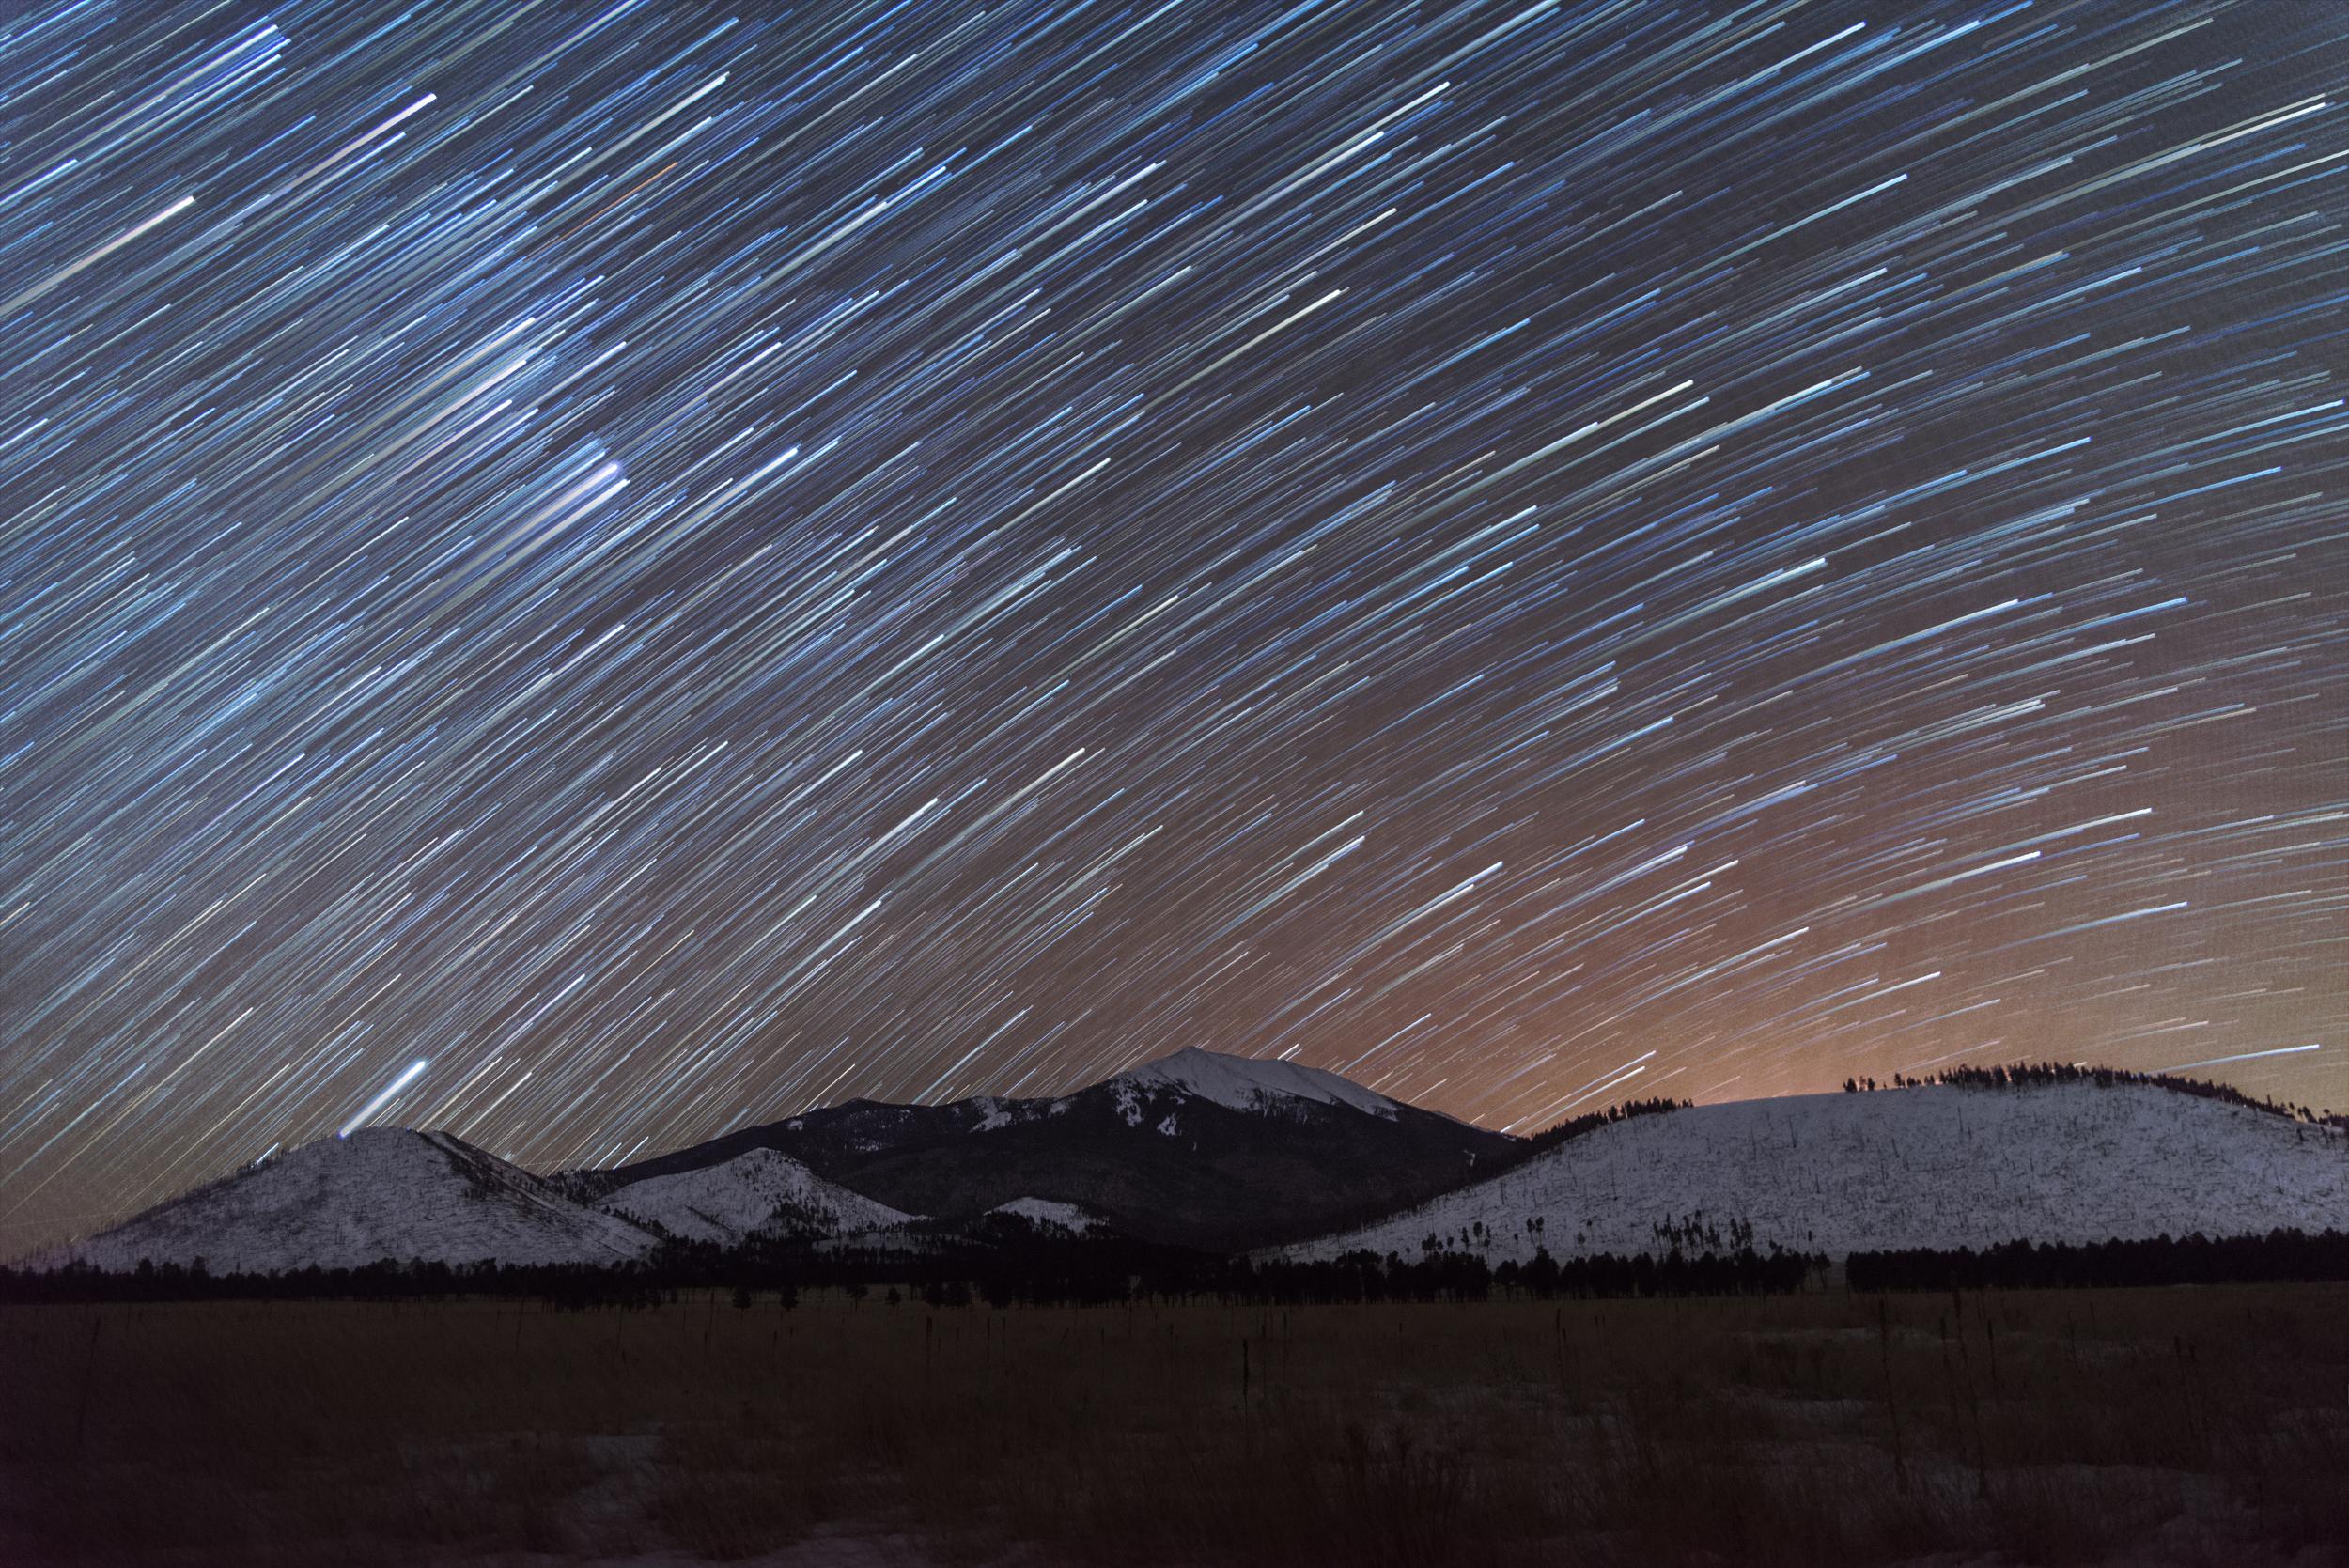 Peaks Star Trails